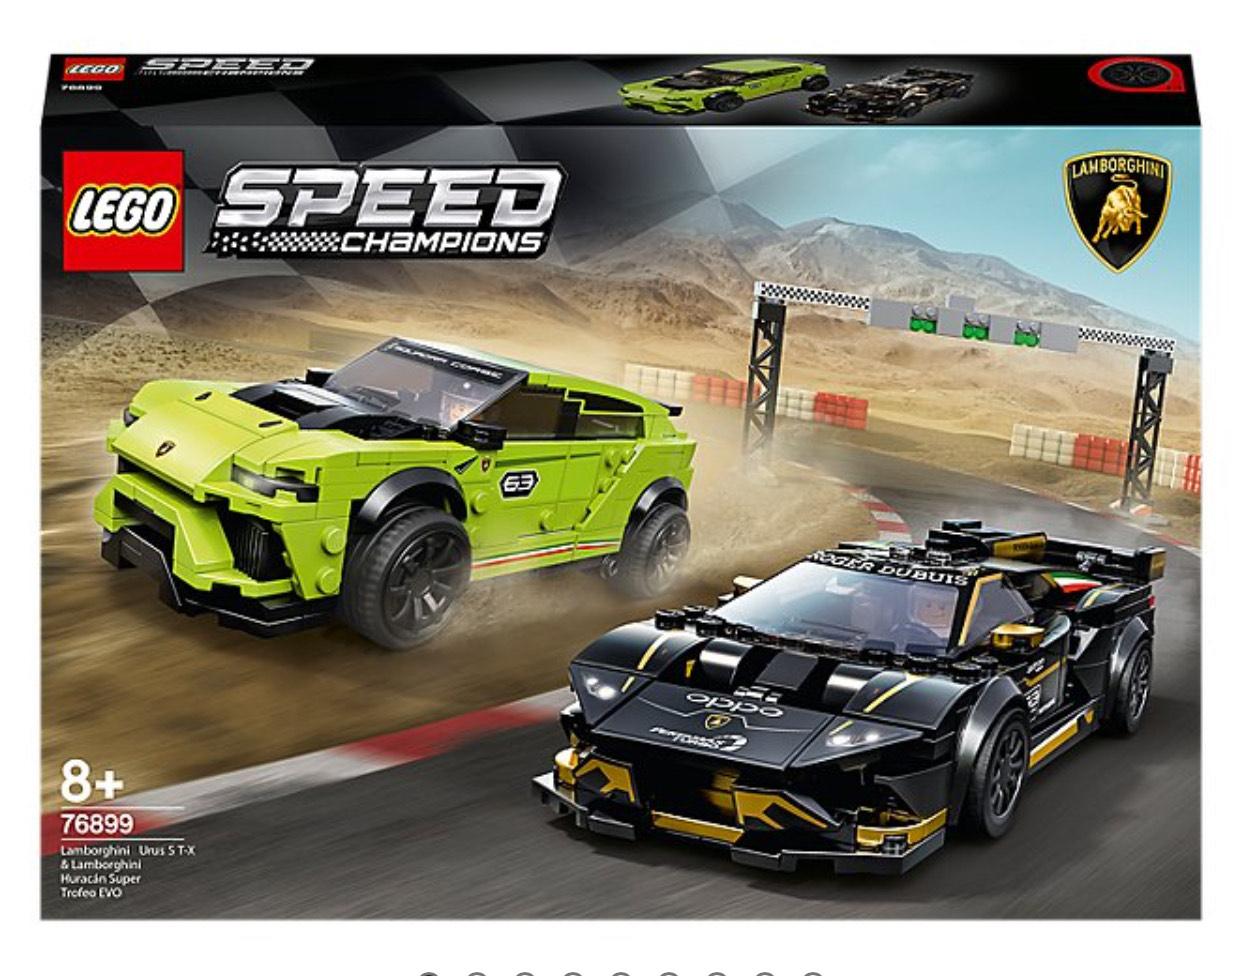 LEGO 76899 Speed Champions Lamborghini Huracán Super Trofeo EVO and Lamborghini Urus ST-X £39.97 at Asda George